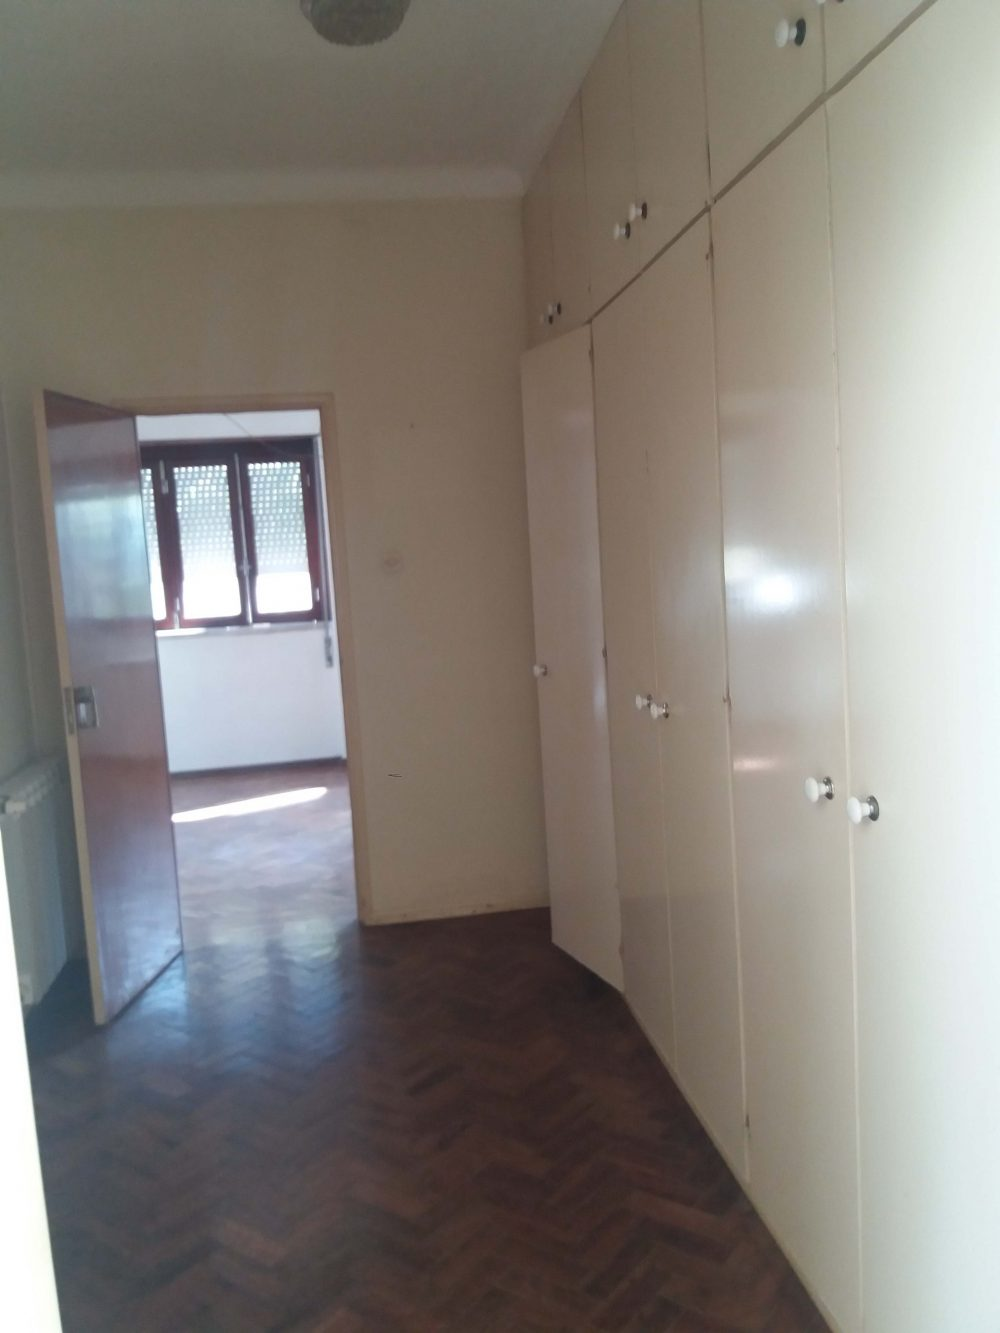 14-Hallway to house 2